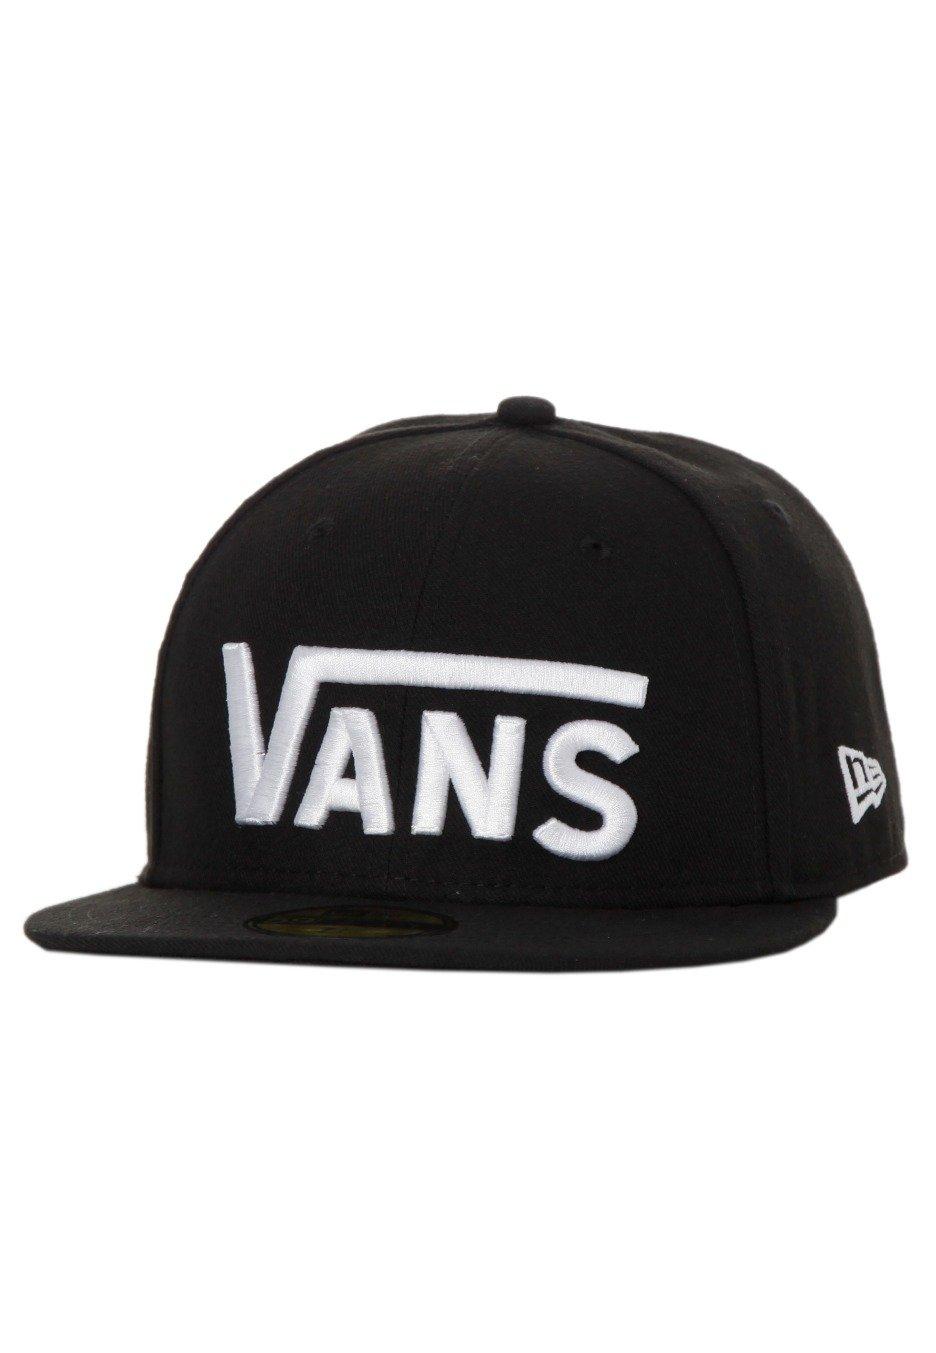 vans new era